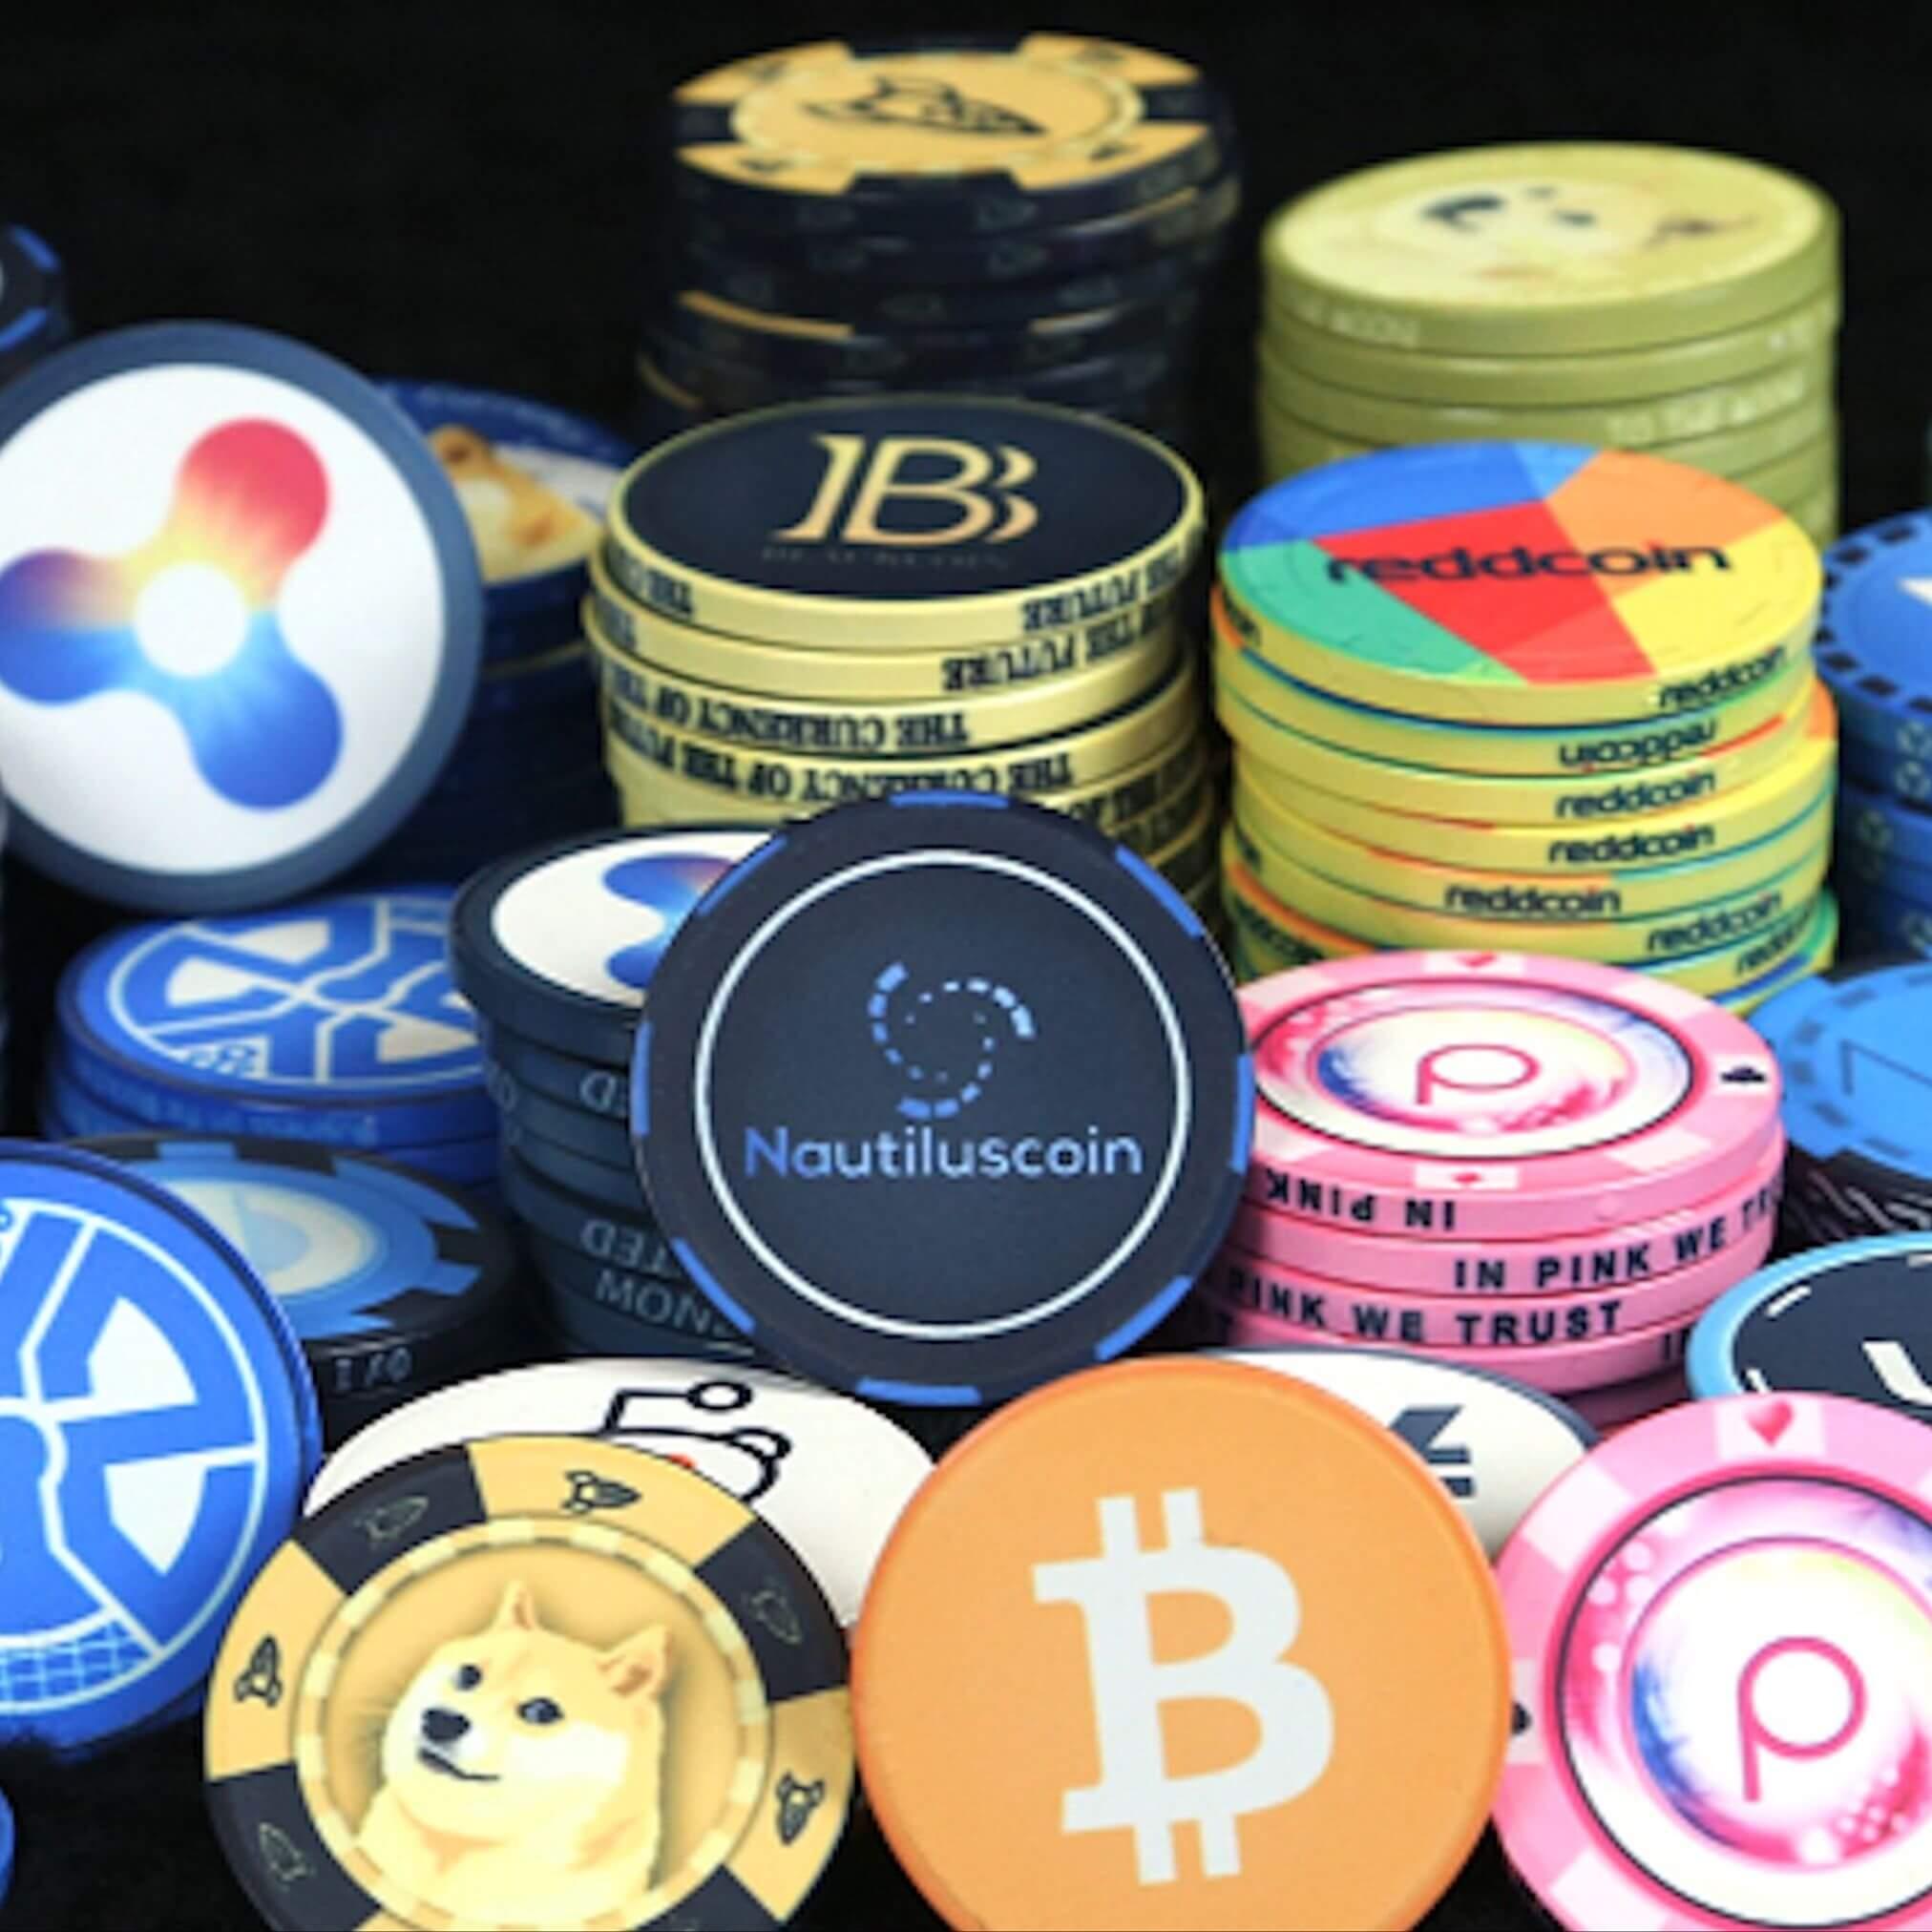 svetainės francais acheter bitcoin